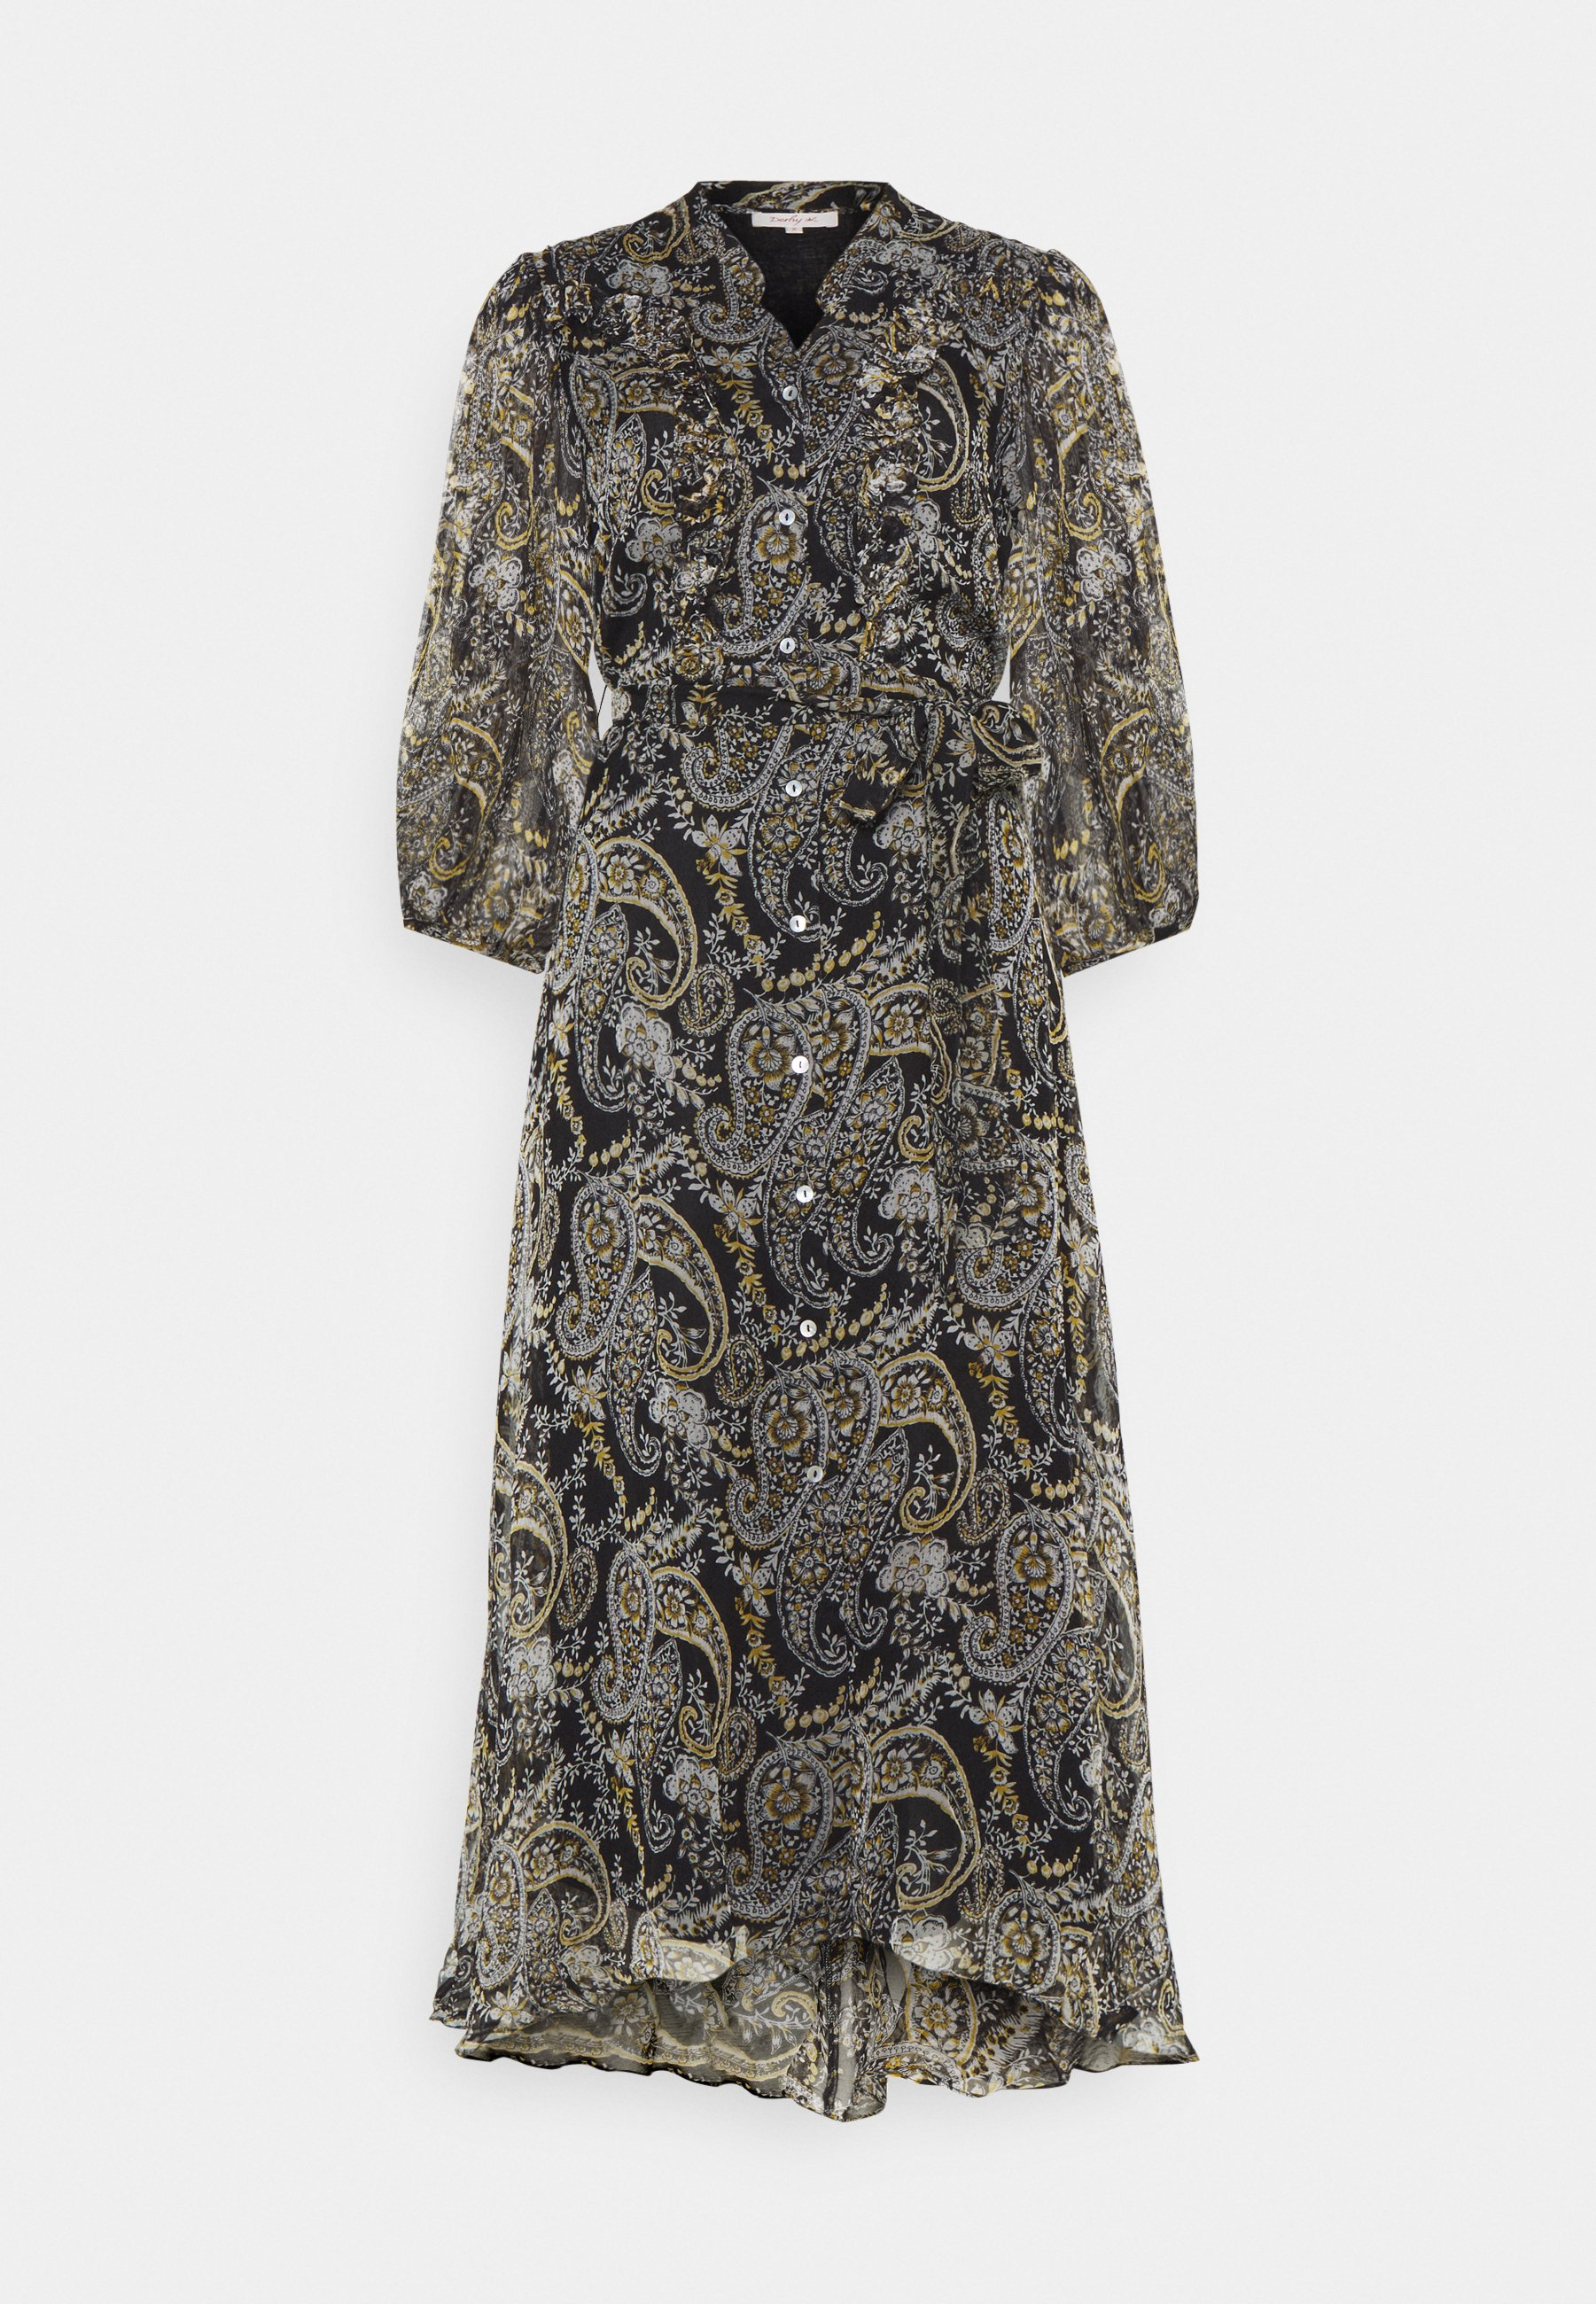 Mønstret jakke i chiffon SortPaisleymønstret DAME | H&M NO